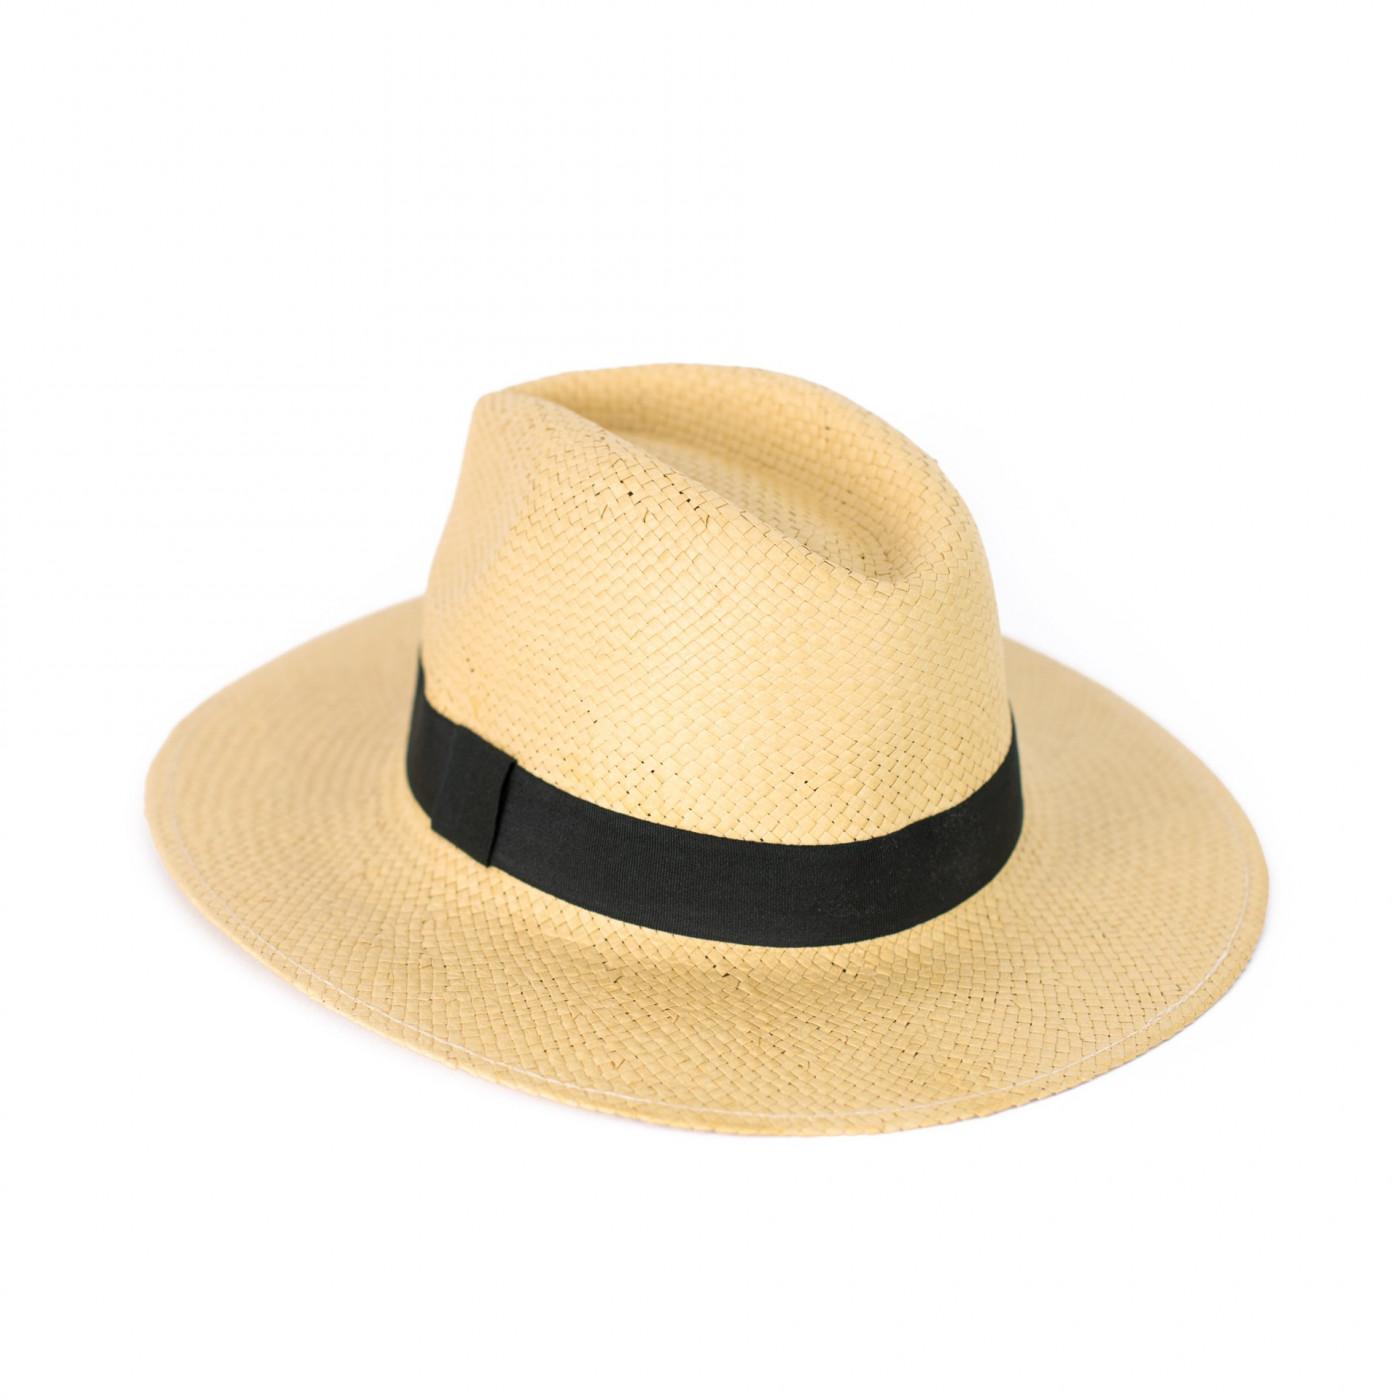 Art Of Polo Unisex's Hat cz19103